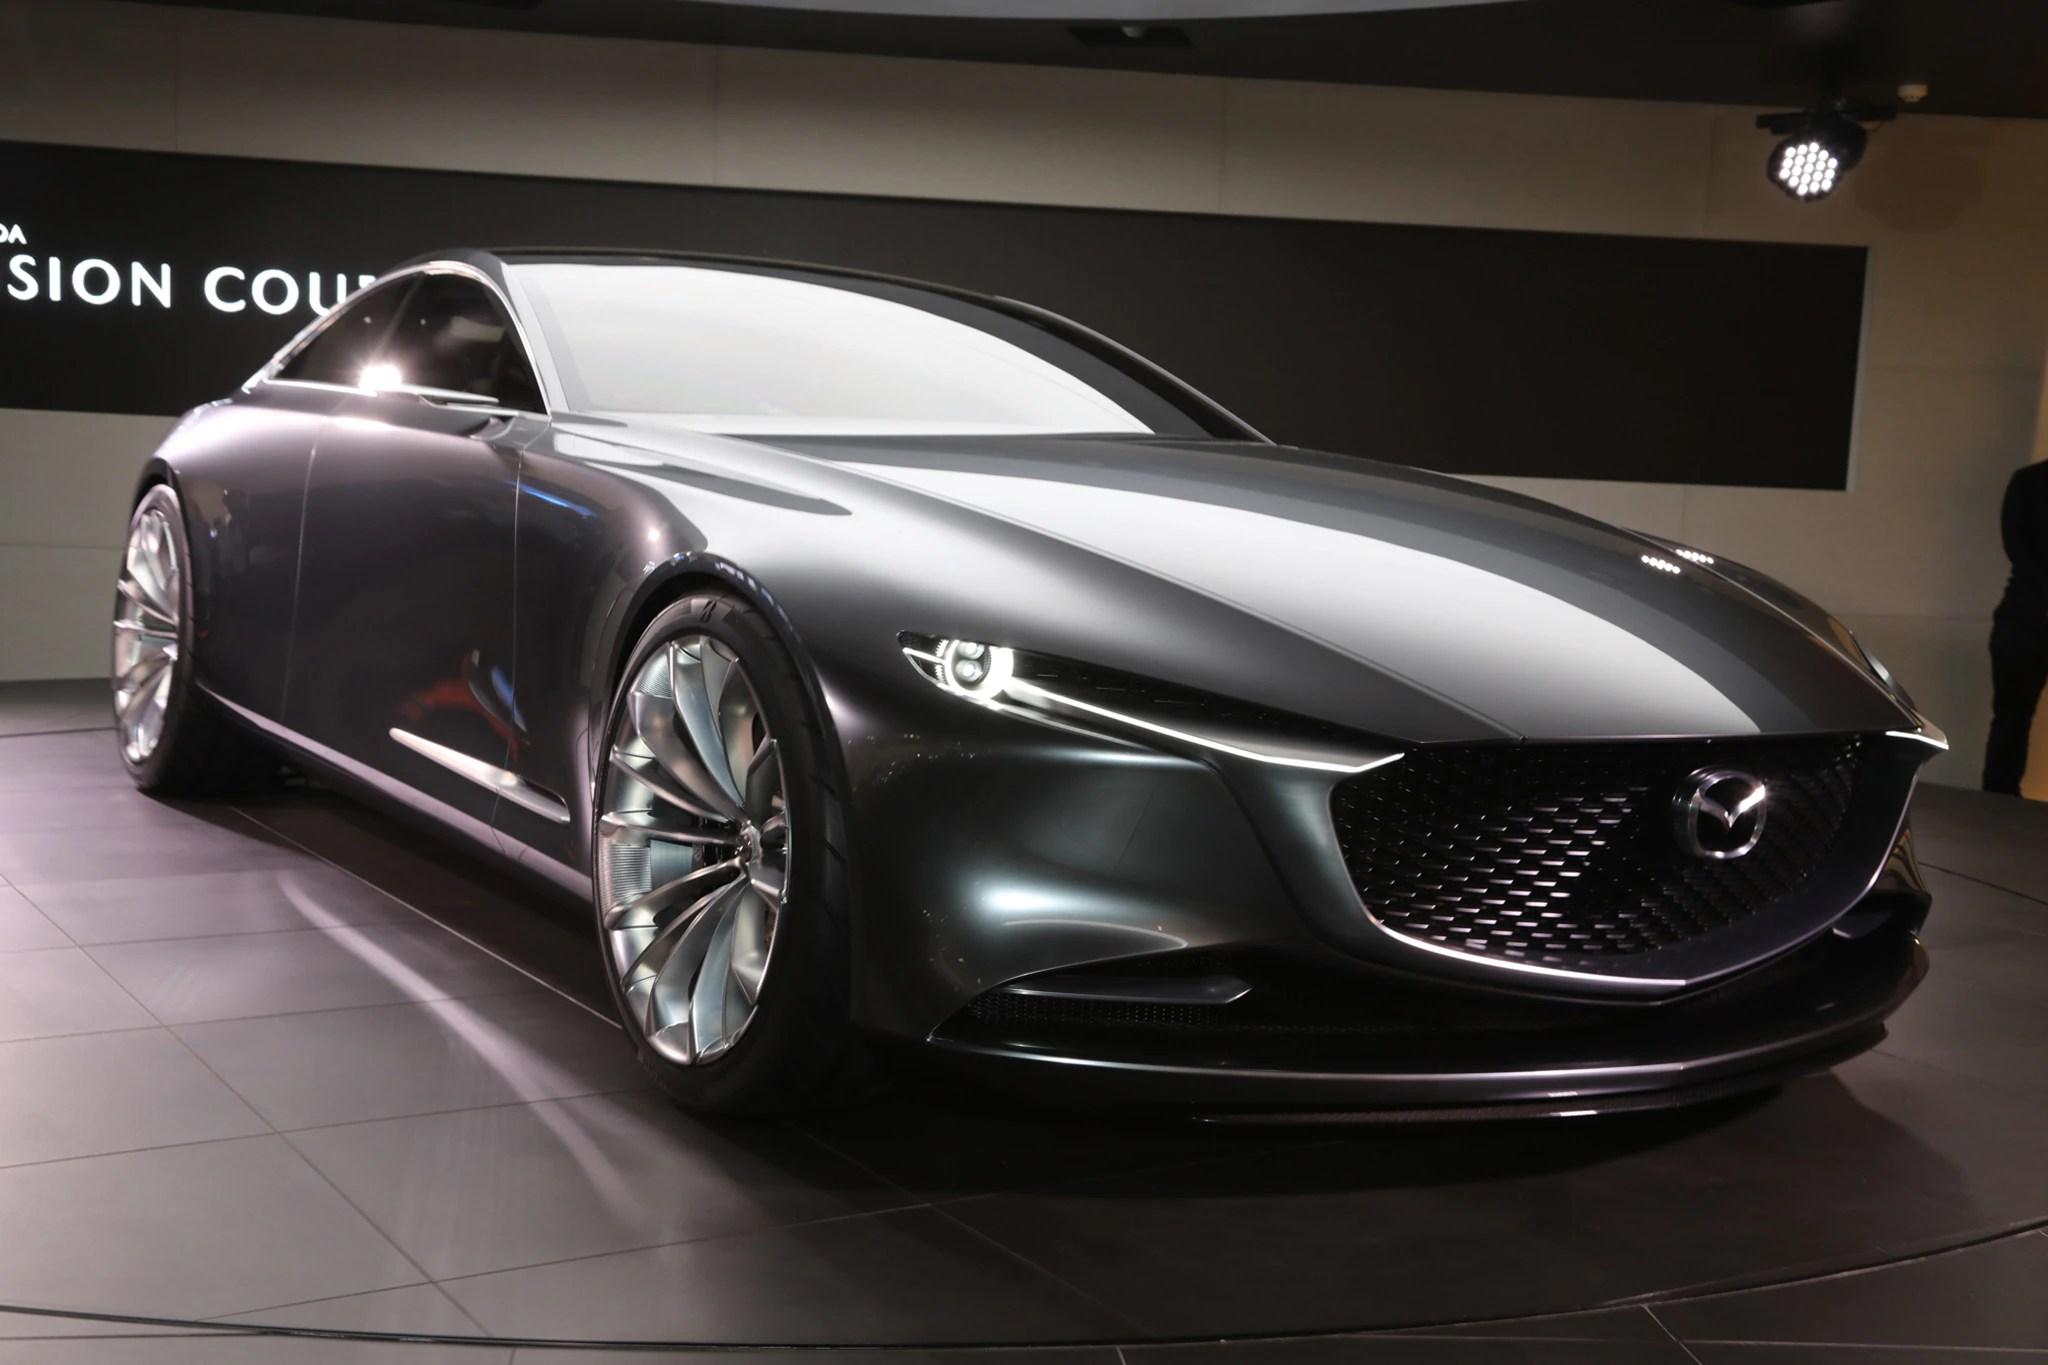 Genesis Car Wallpaper Mazda Vision Coupe Concept Hints At Rwd Non Rotary